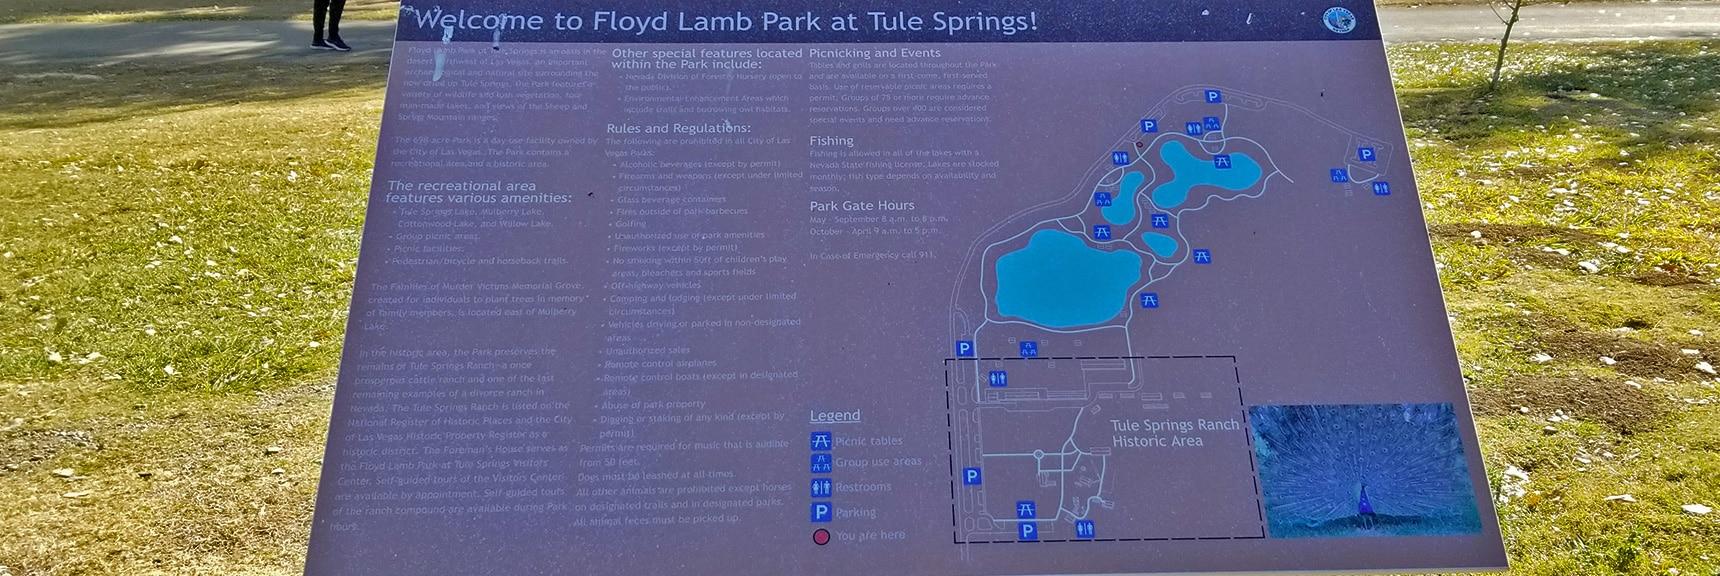 4 Lakes at Floyd Lamb Park   Centennial Hills Mountain Bike Conditioning Adventure Loop, Las Vegas, Nevada